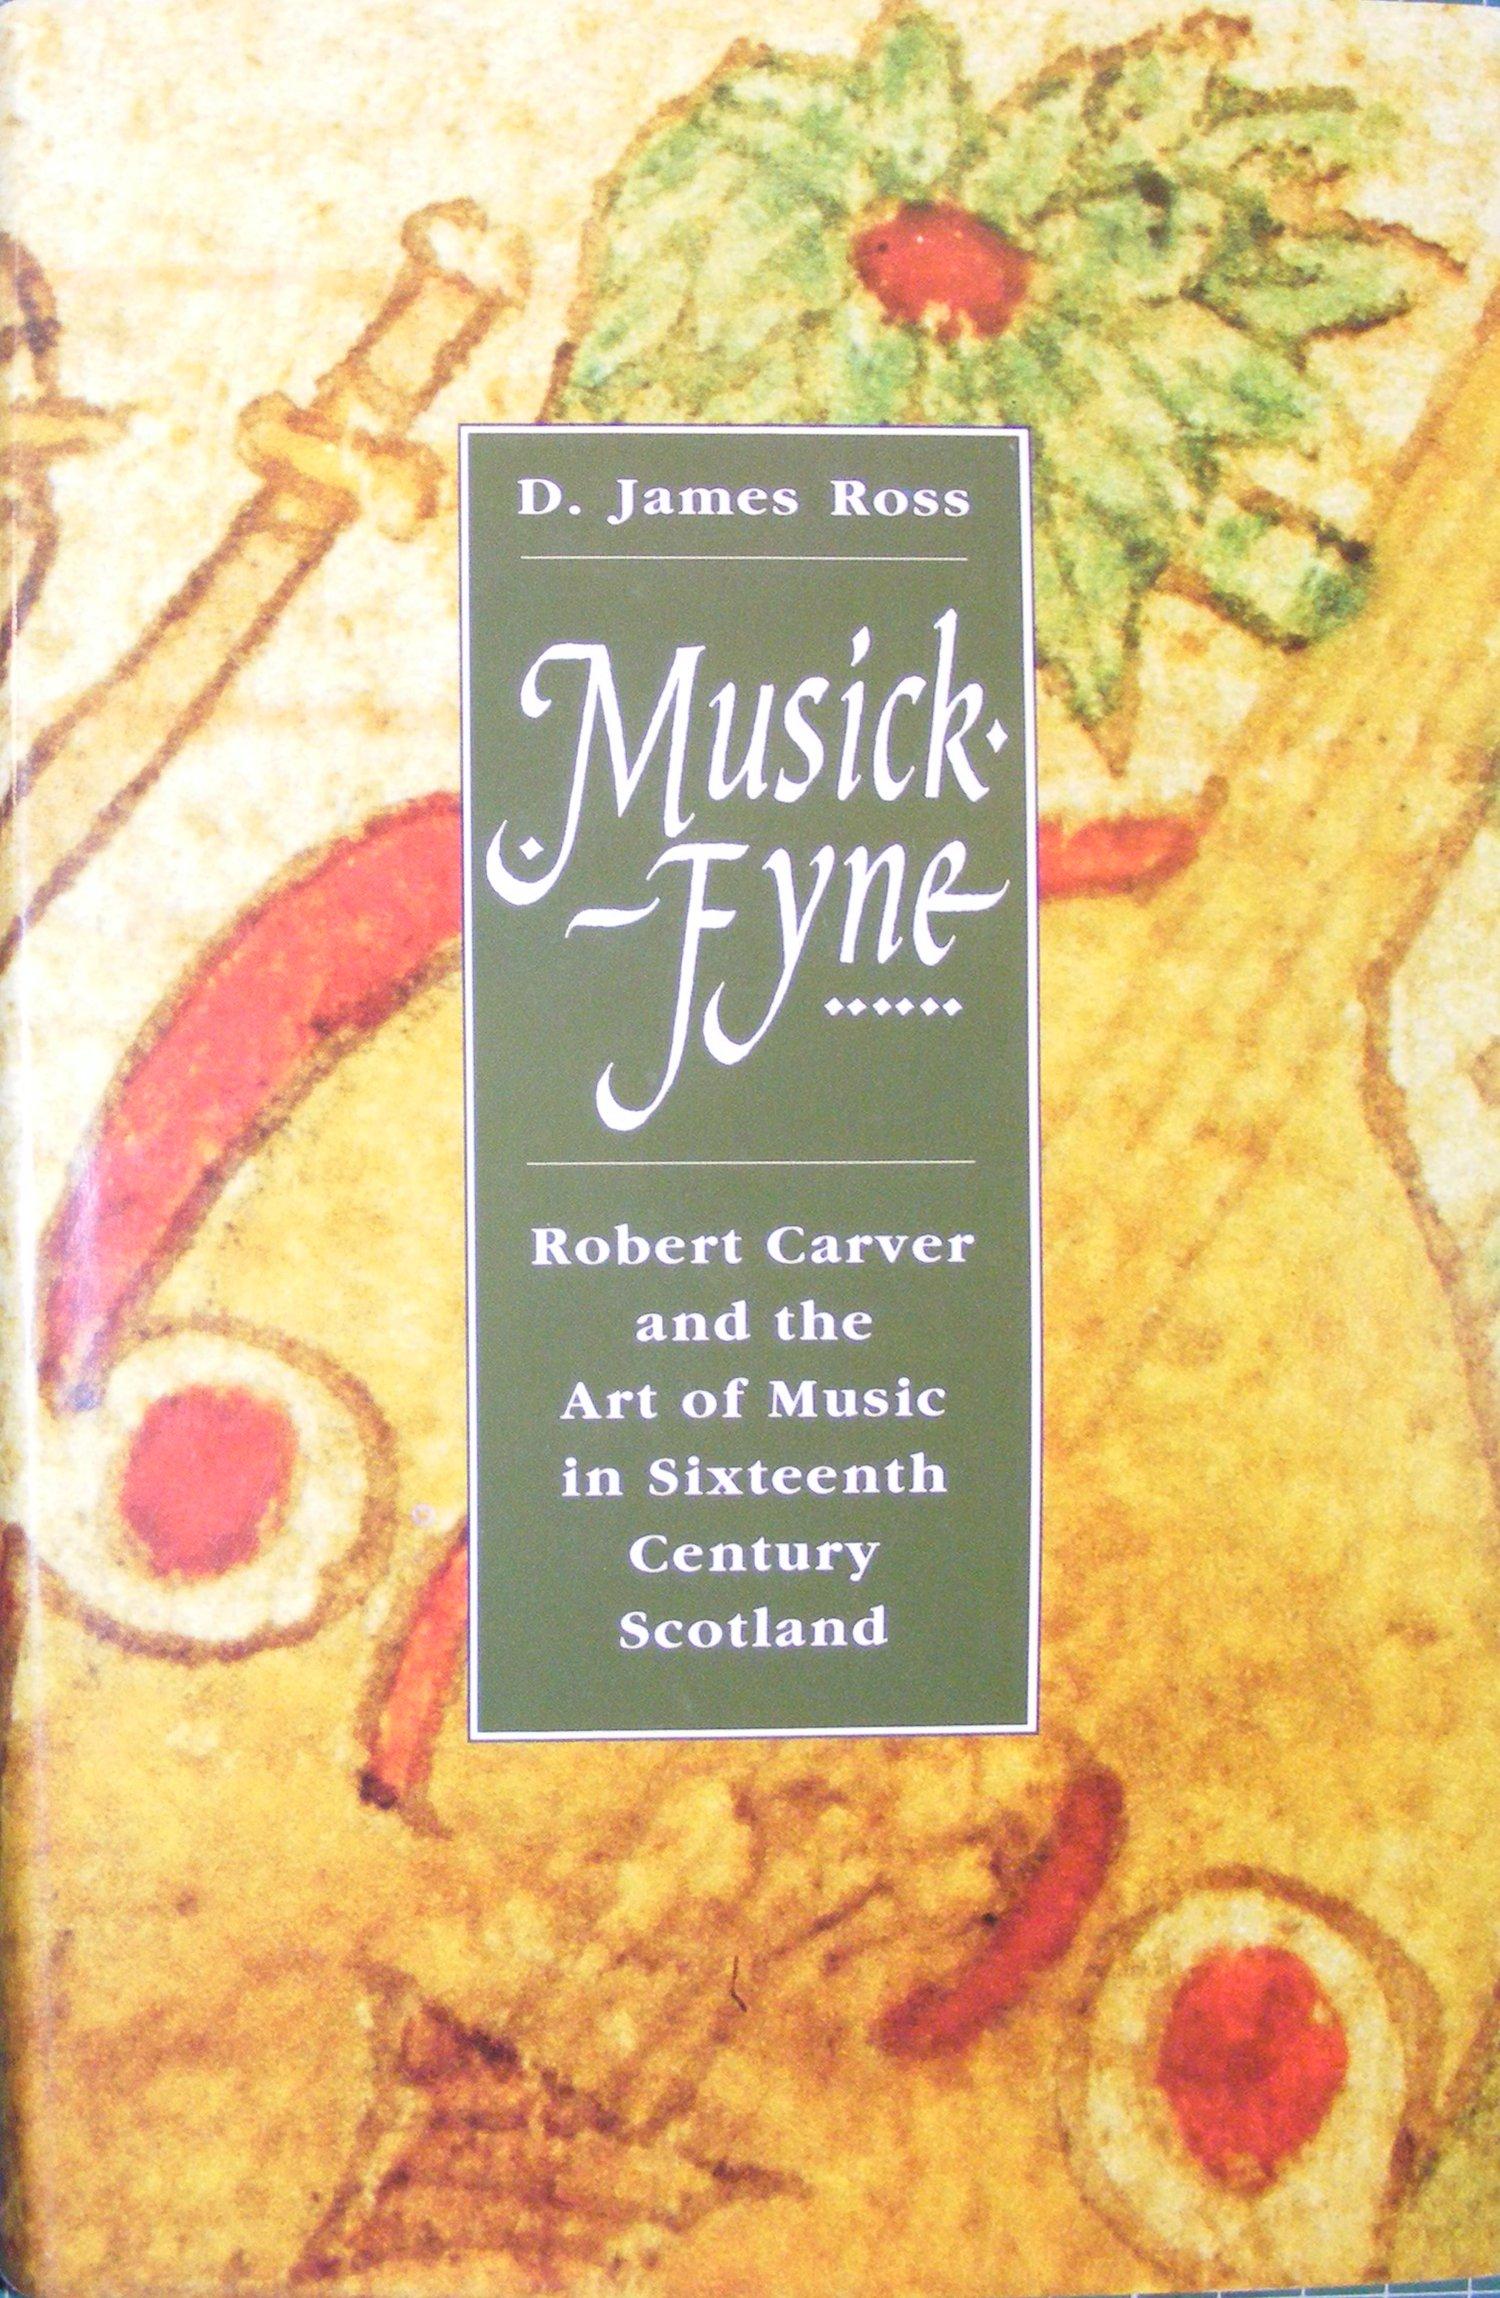 Read Online Musick Fyne: Robert Carver and the Art of Music in Sixteenth Century Scotland ebook